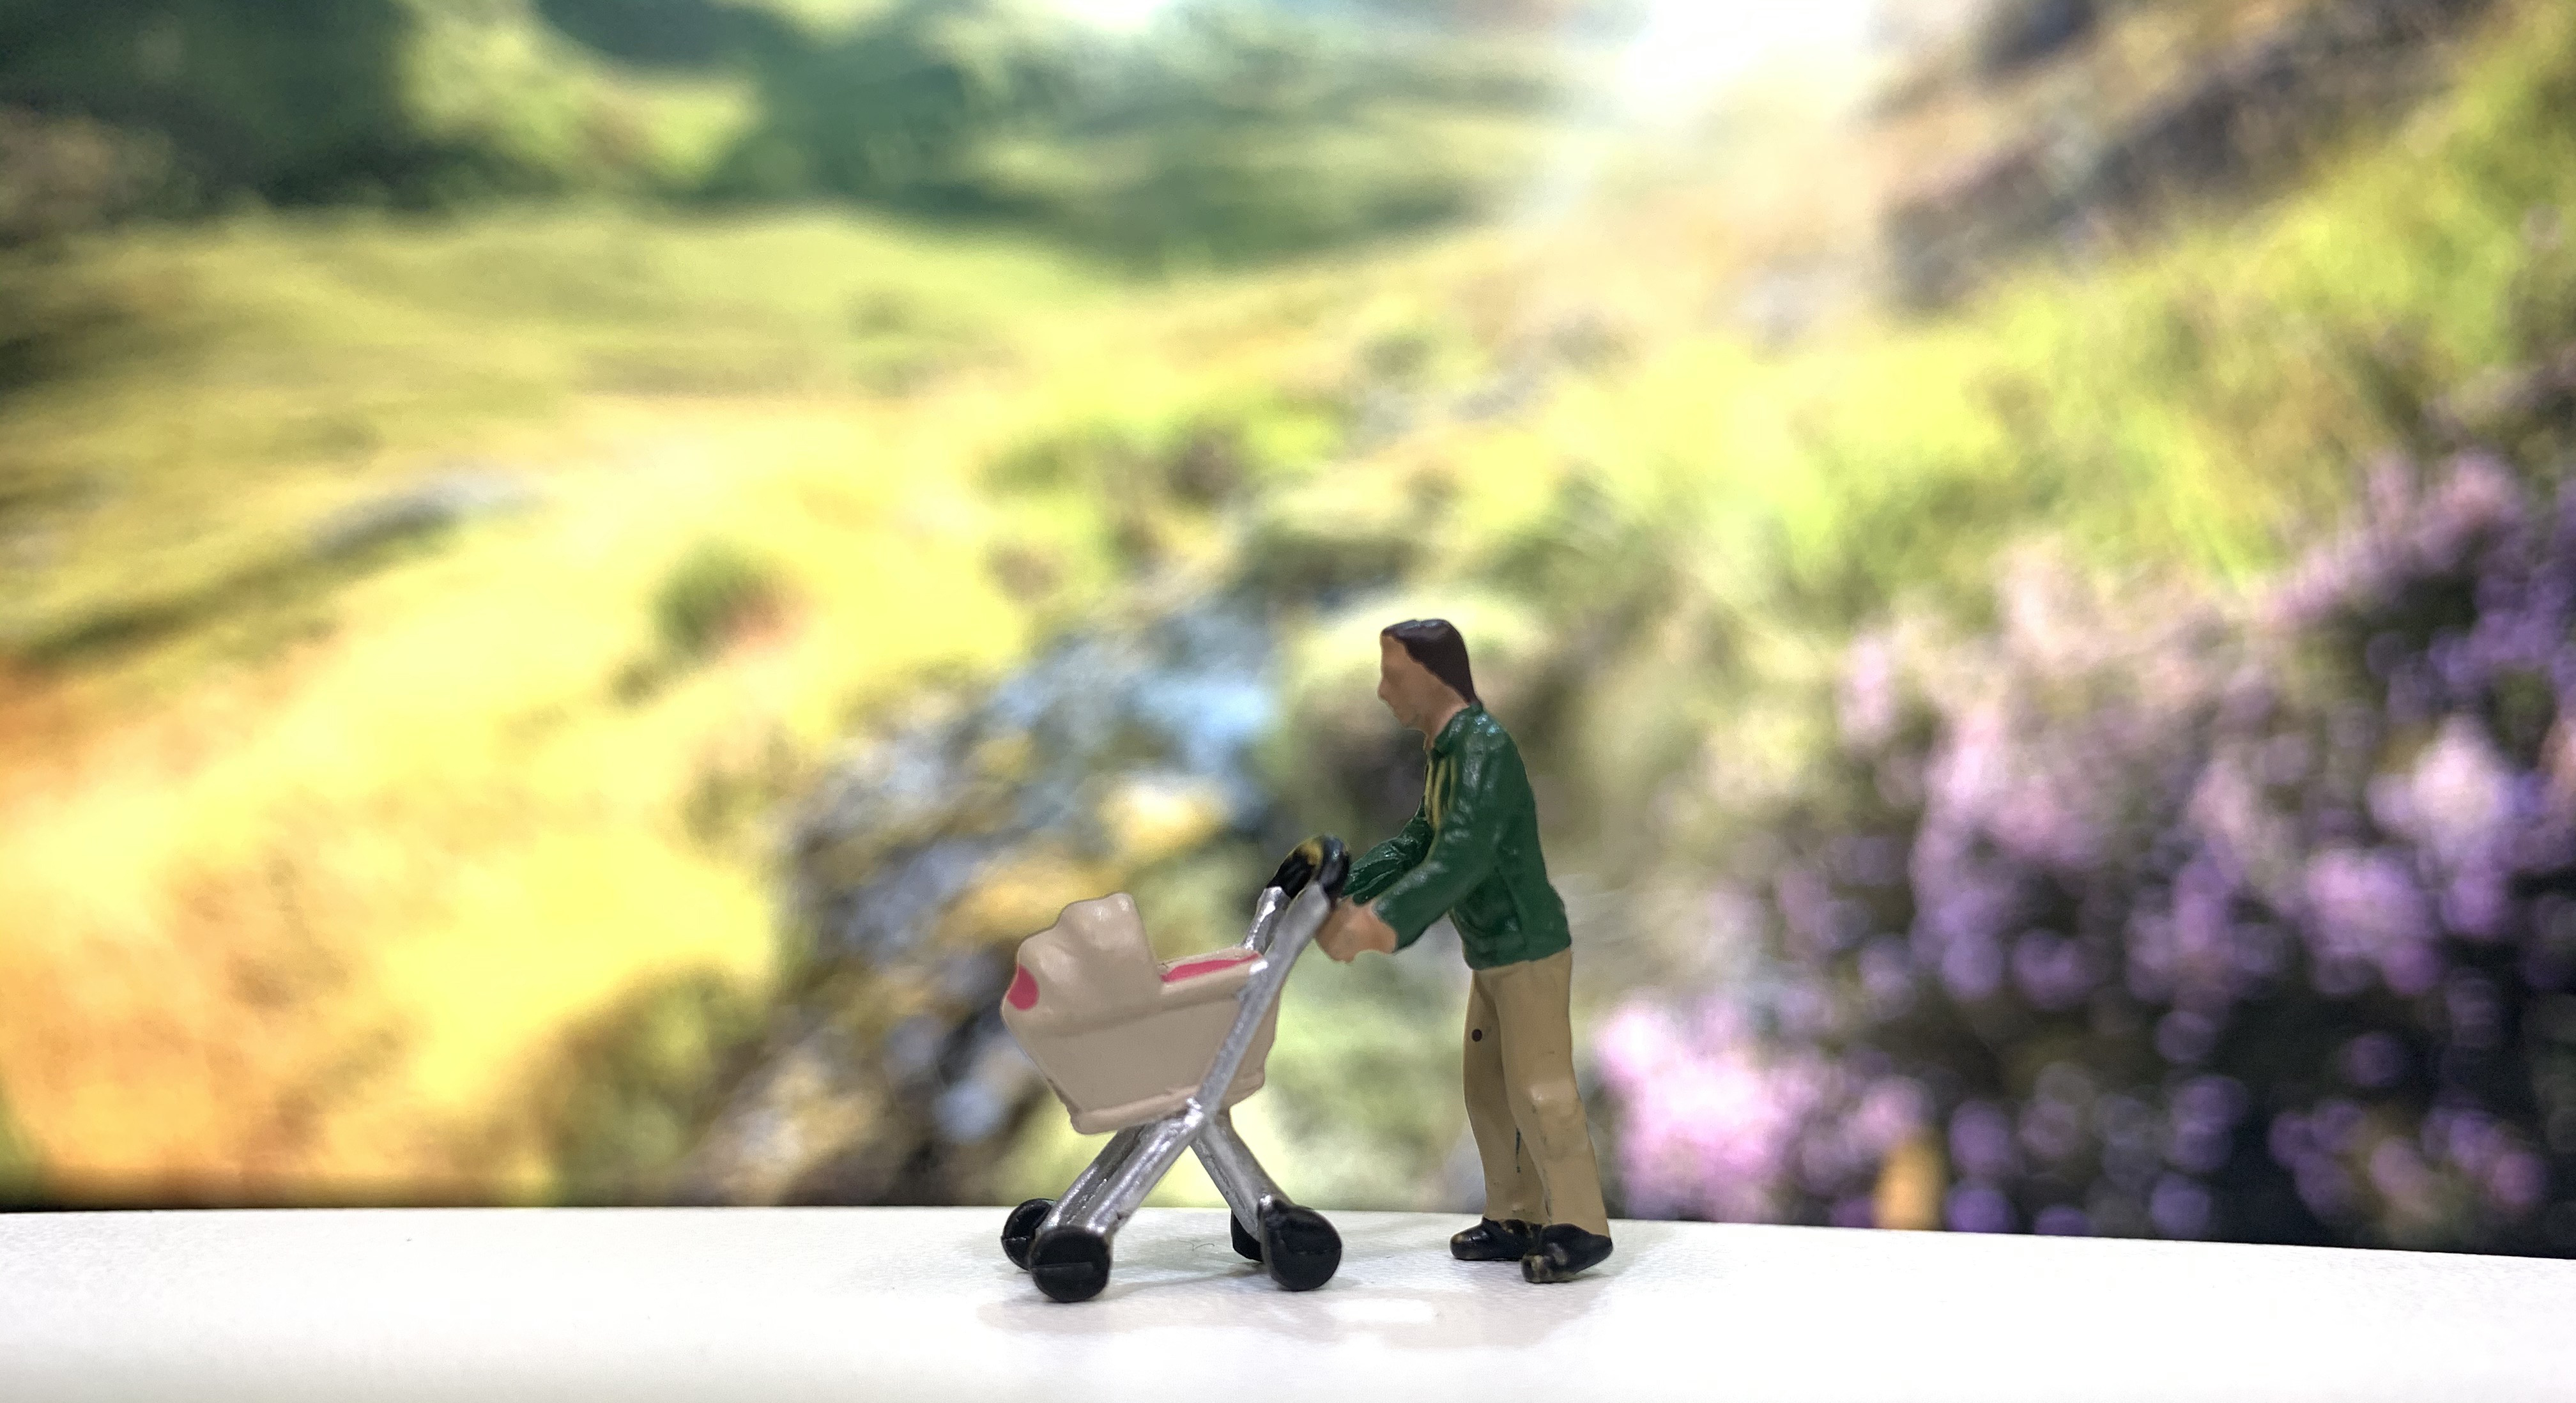 small model figure pushing a pram